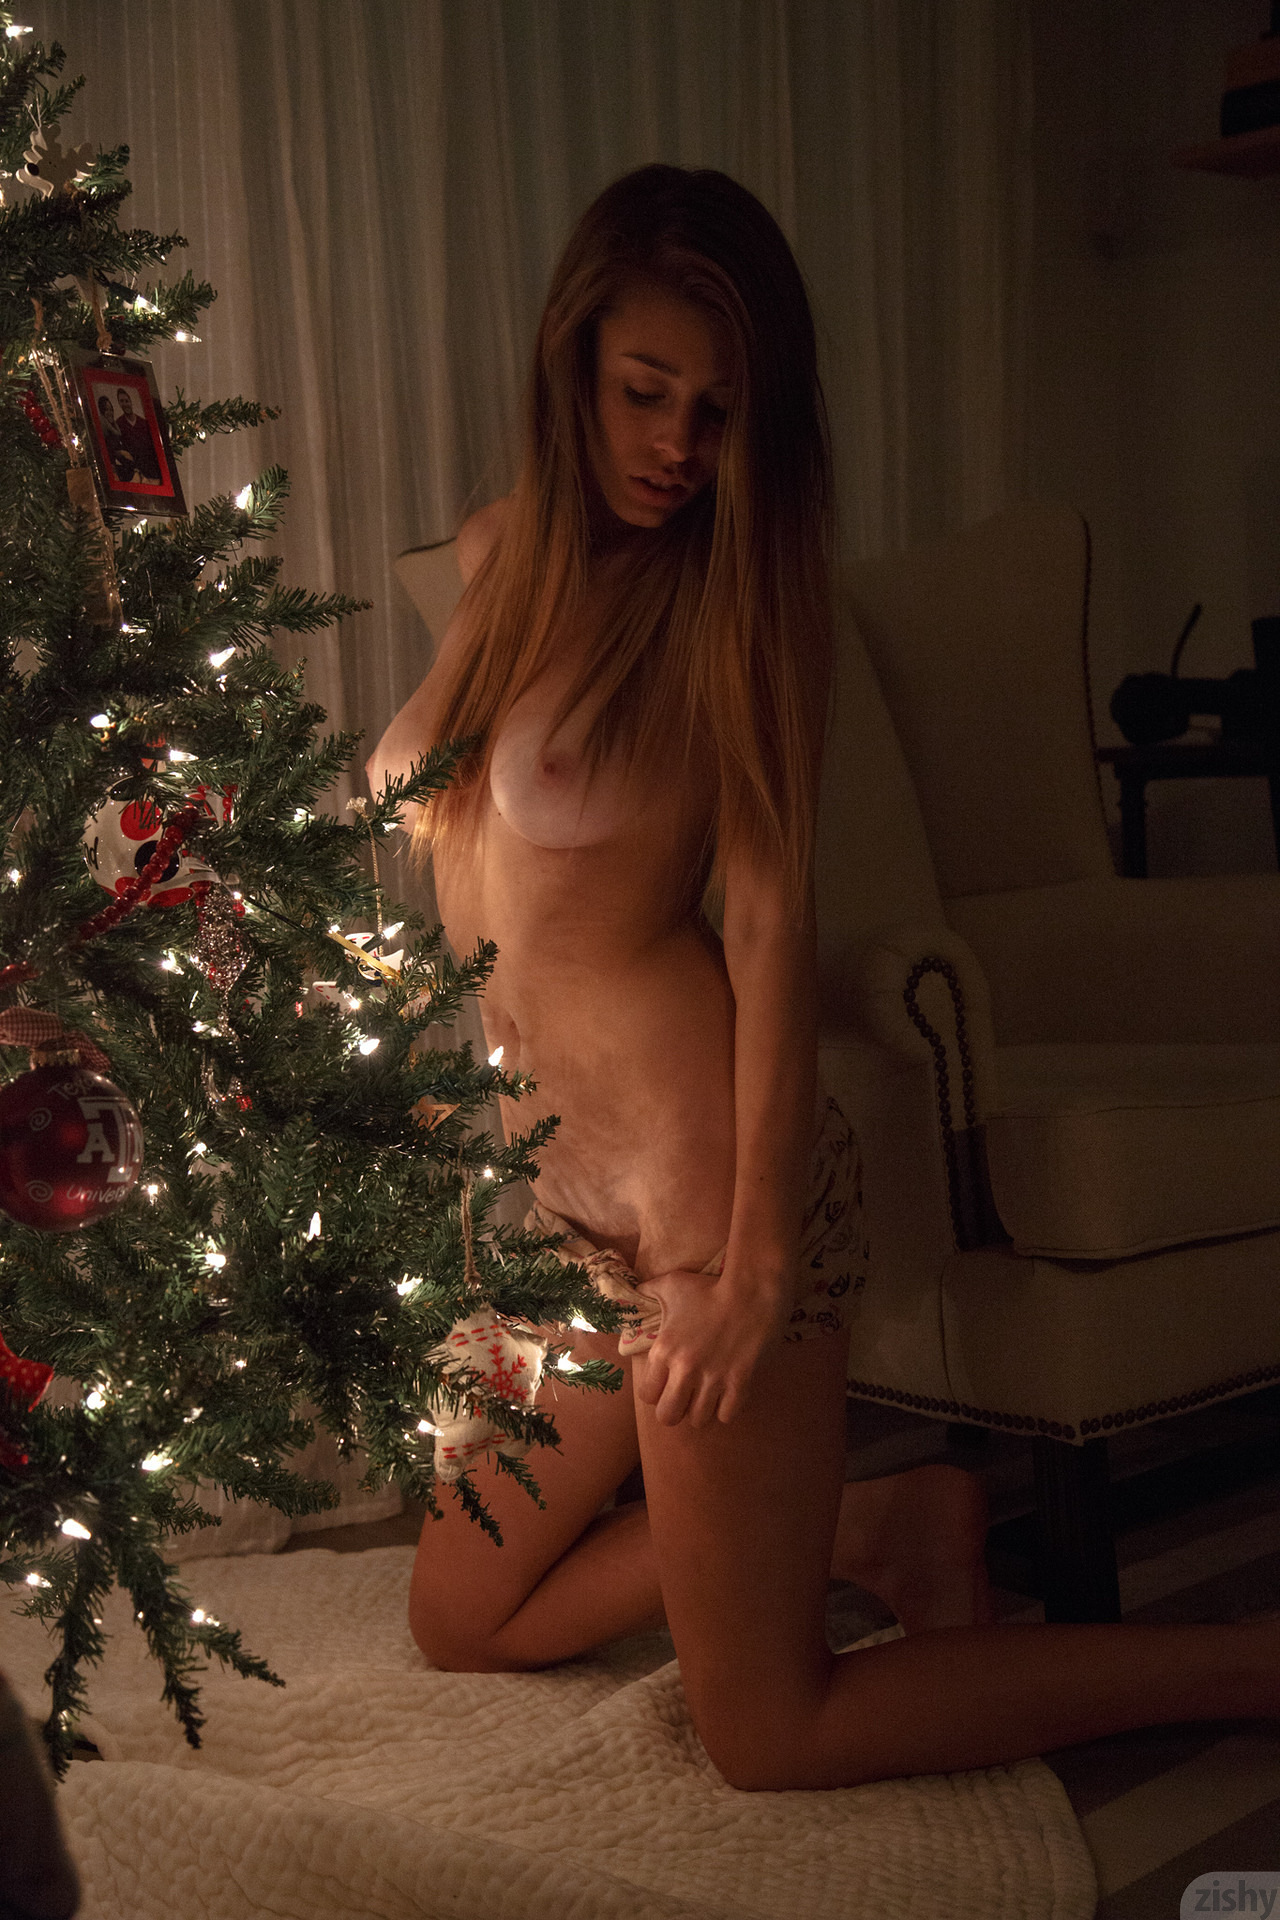 gracie-thibble-christmas-morning-boobs-zishy-32